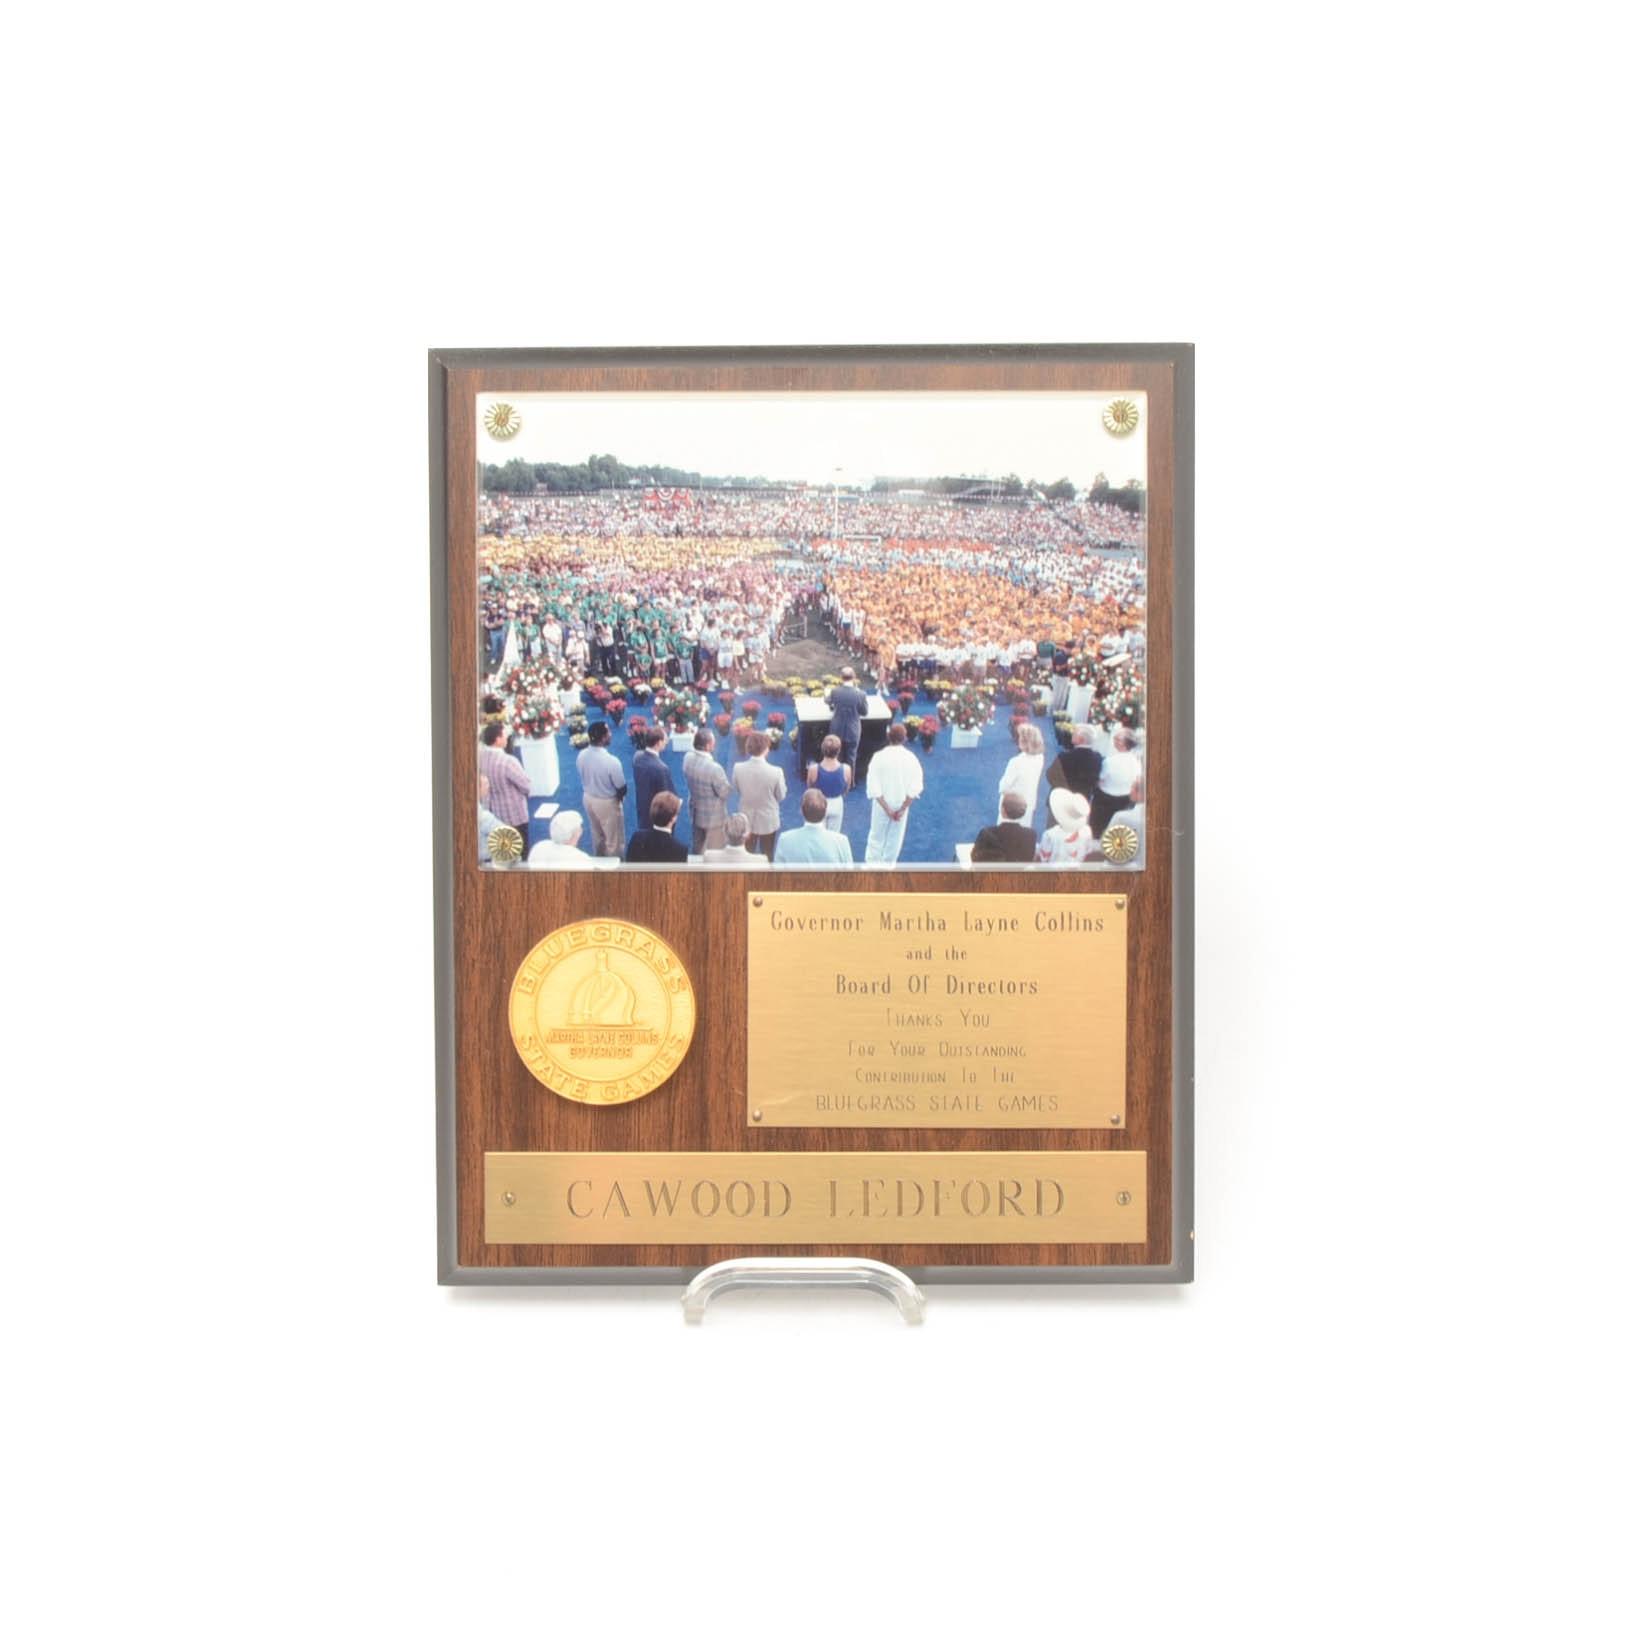 Cawood Ledford Presentation Award